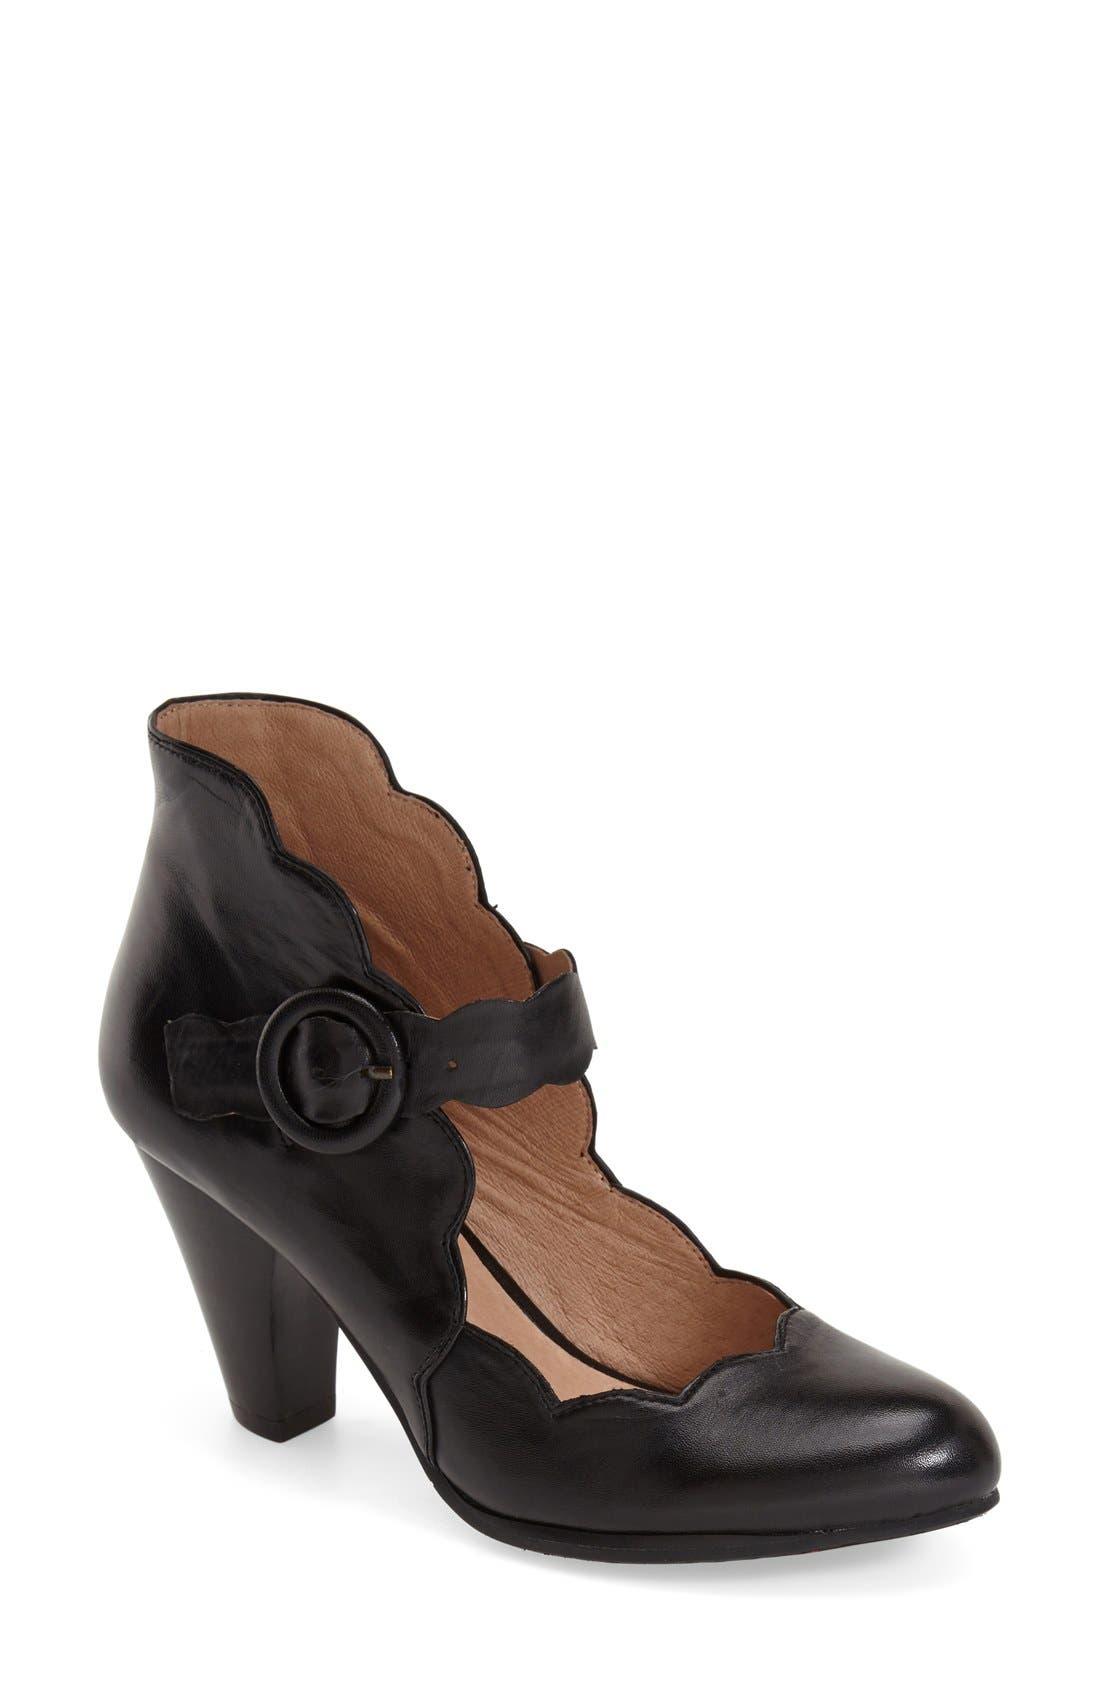 Footwear 'Carissa' Mary Jane Pump,                             Main thumbnail 1, color,                             001